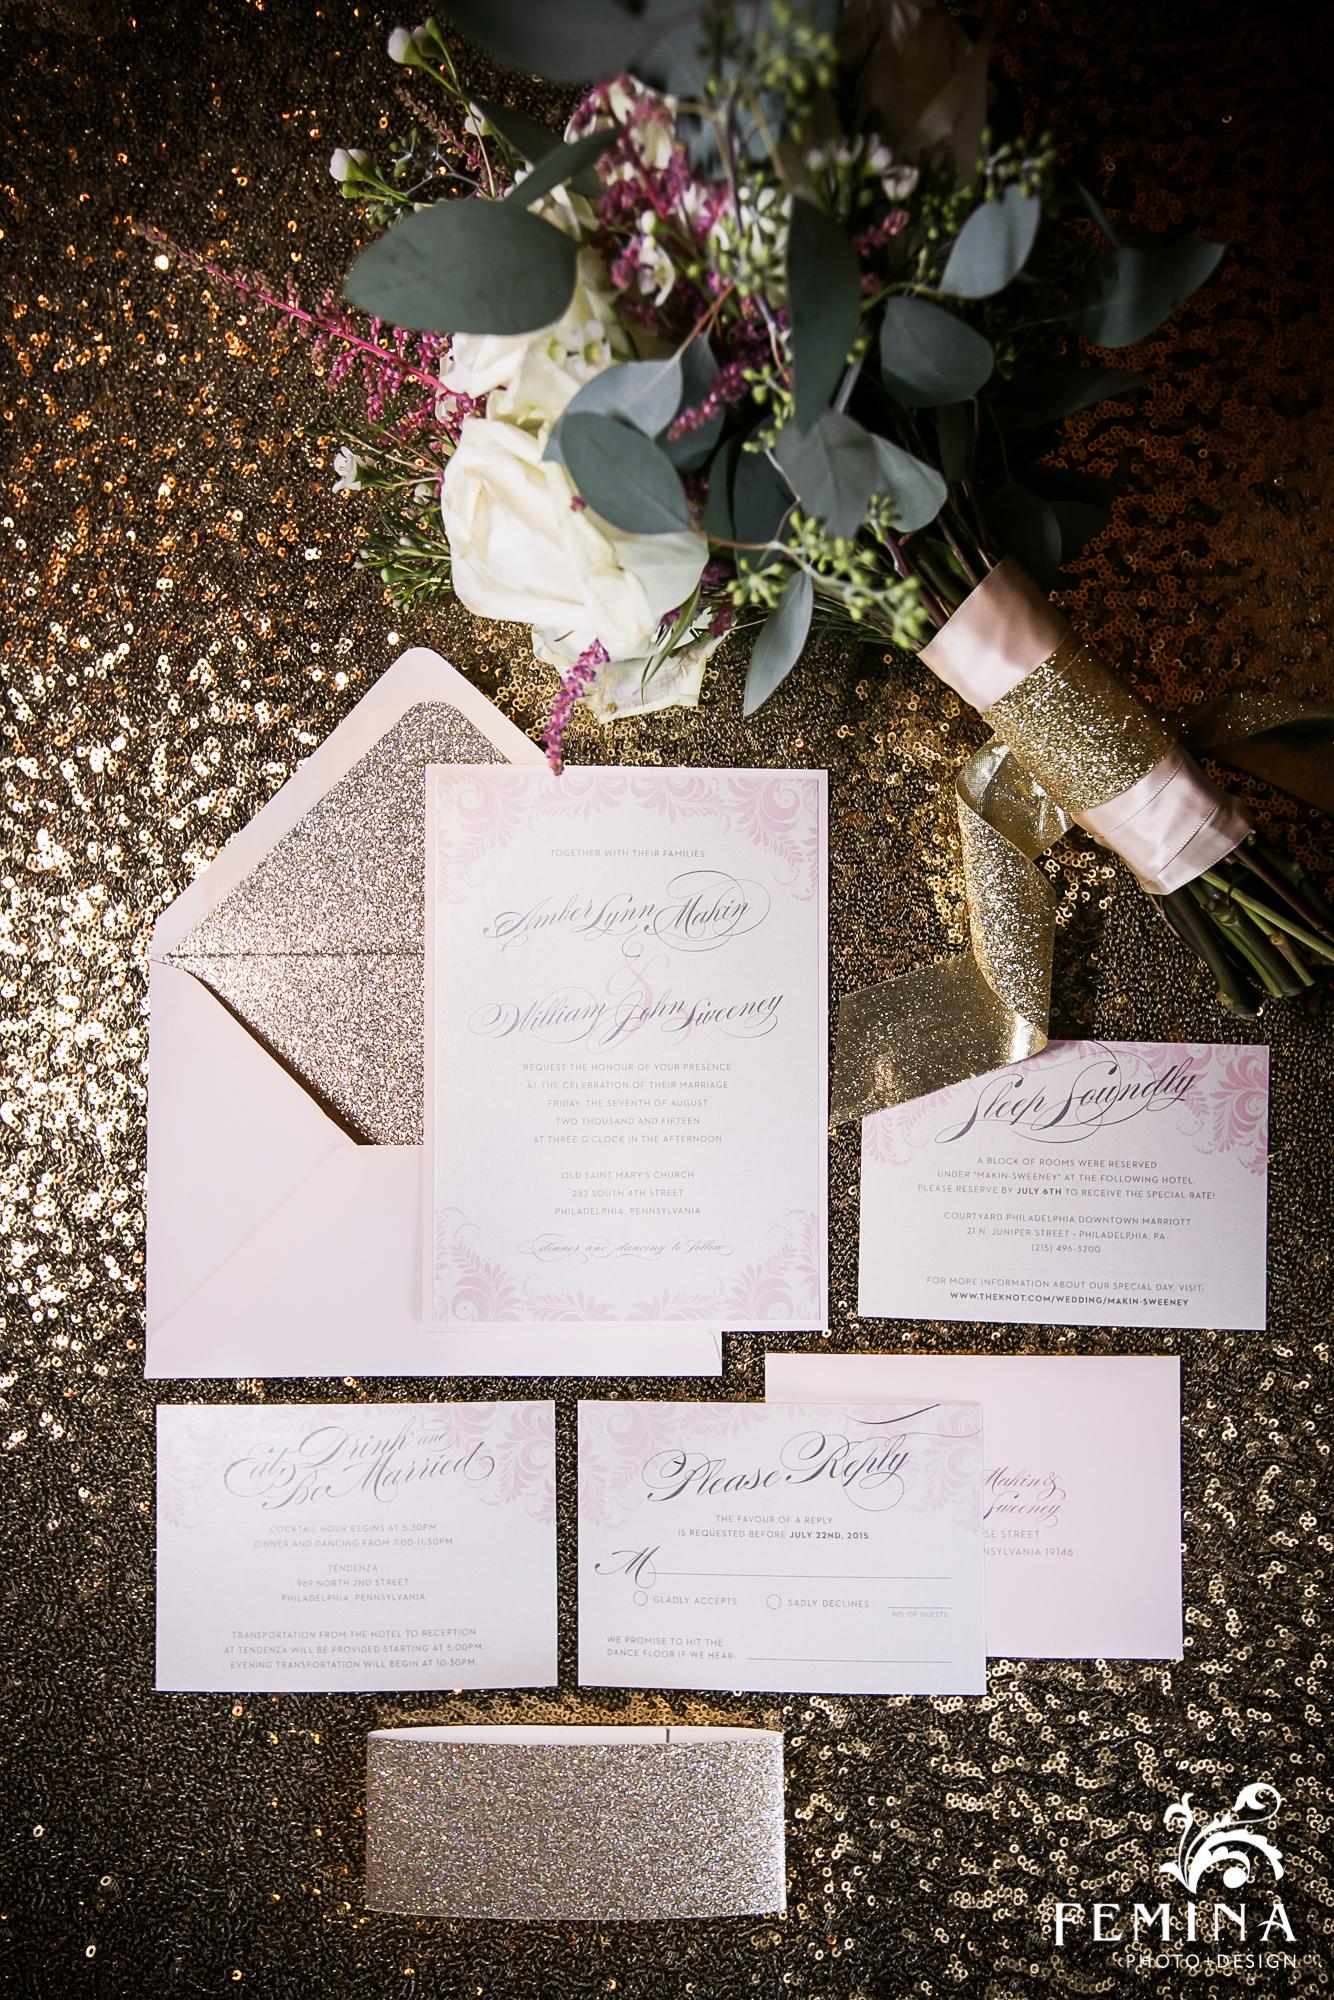 TENDENZA PHILADELPHIA Wedding